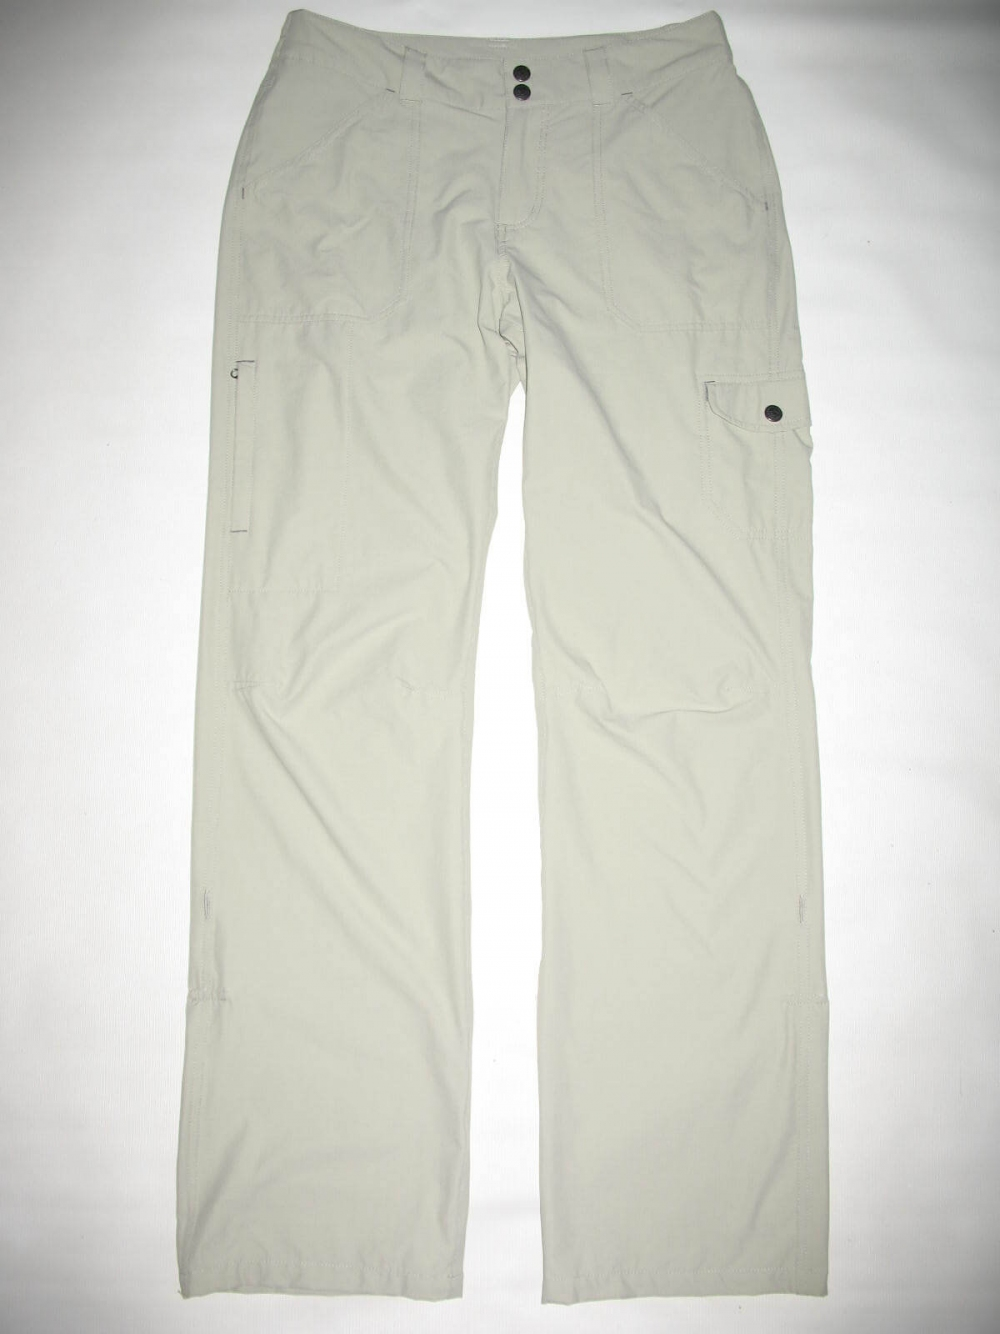 Штаны PATAGONIA nomader pants lady (размер 6-S/M) - 3